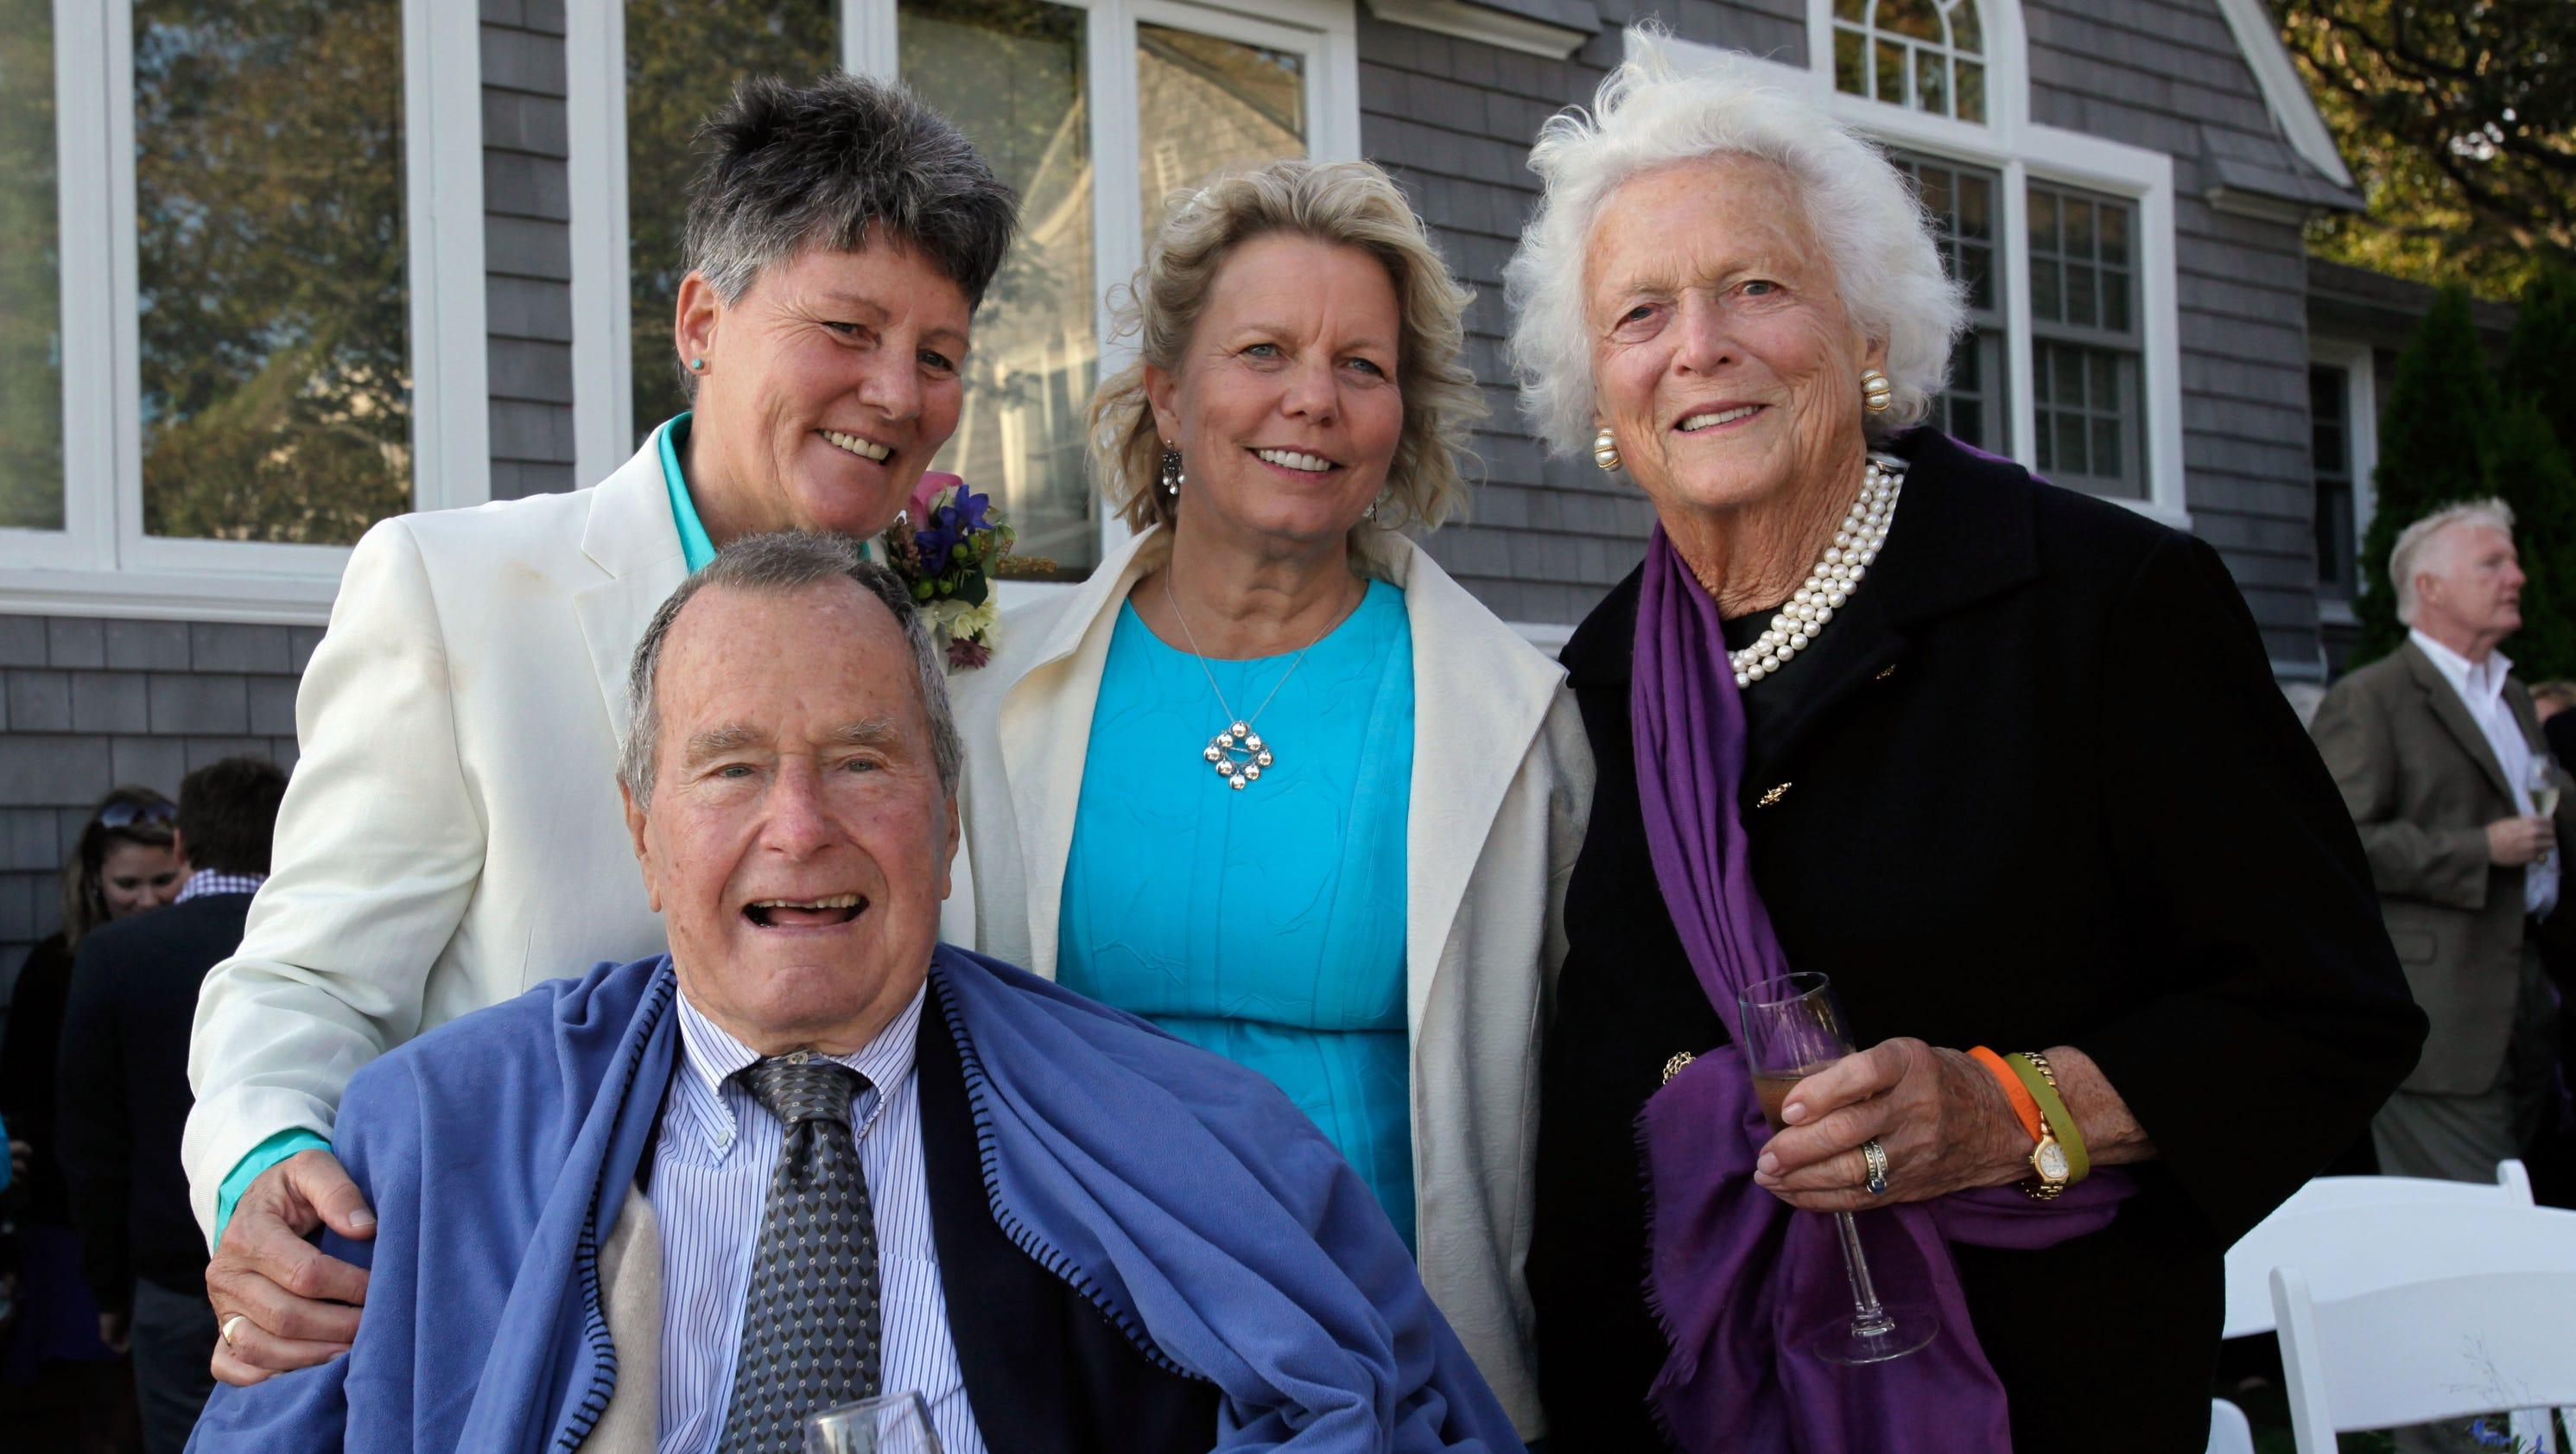 George HW Bush Witness At Same Sex Wedding In Maine